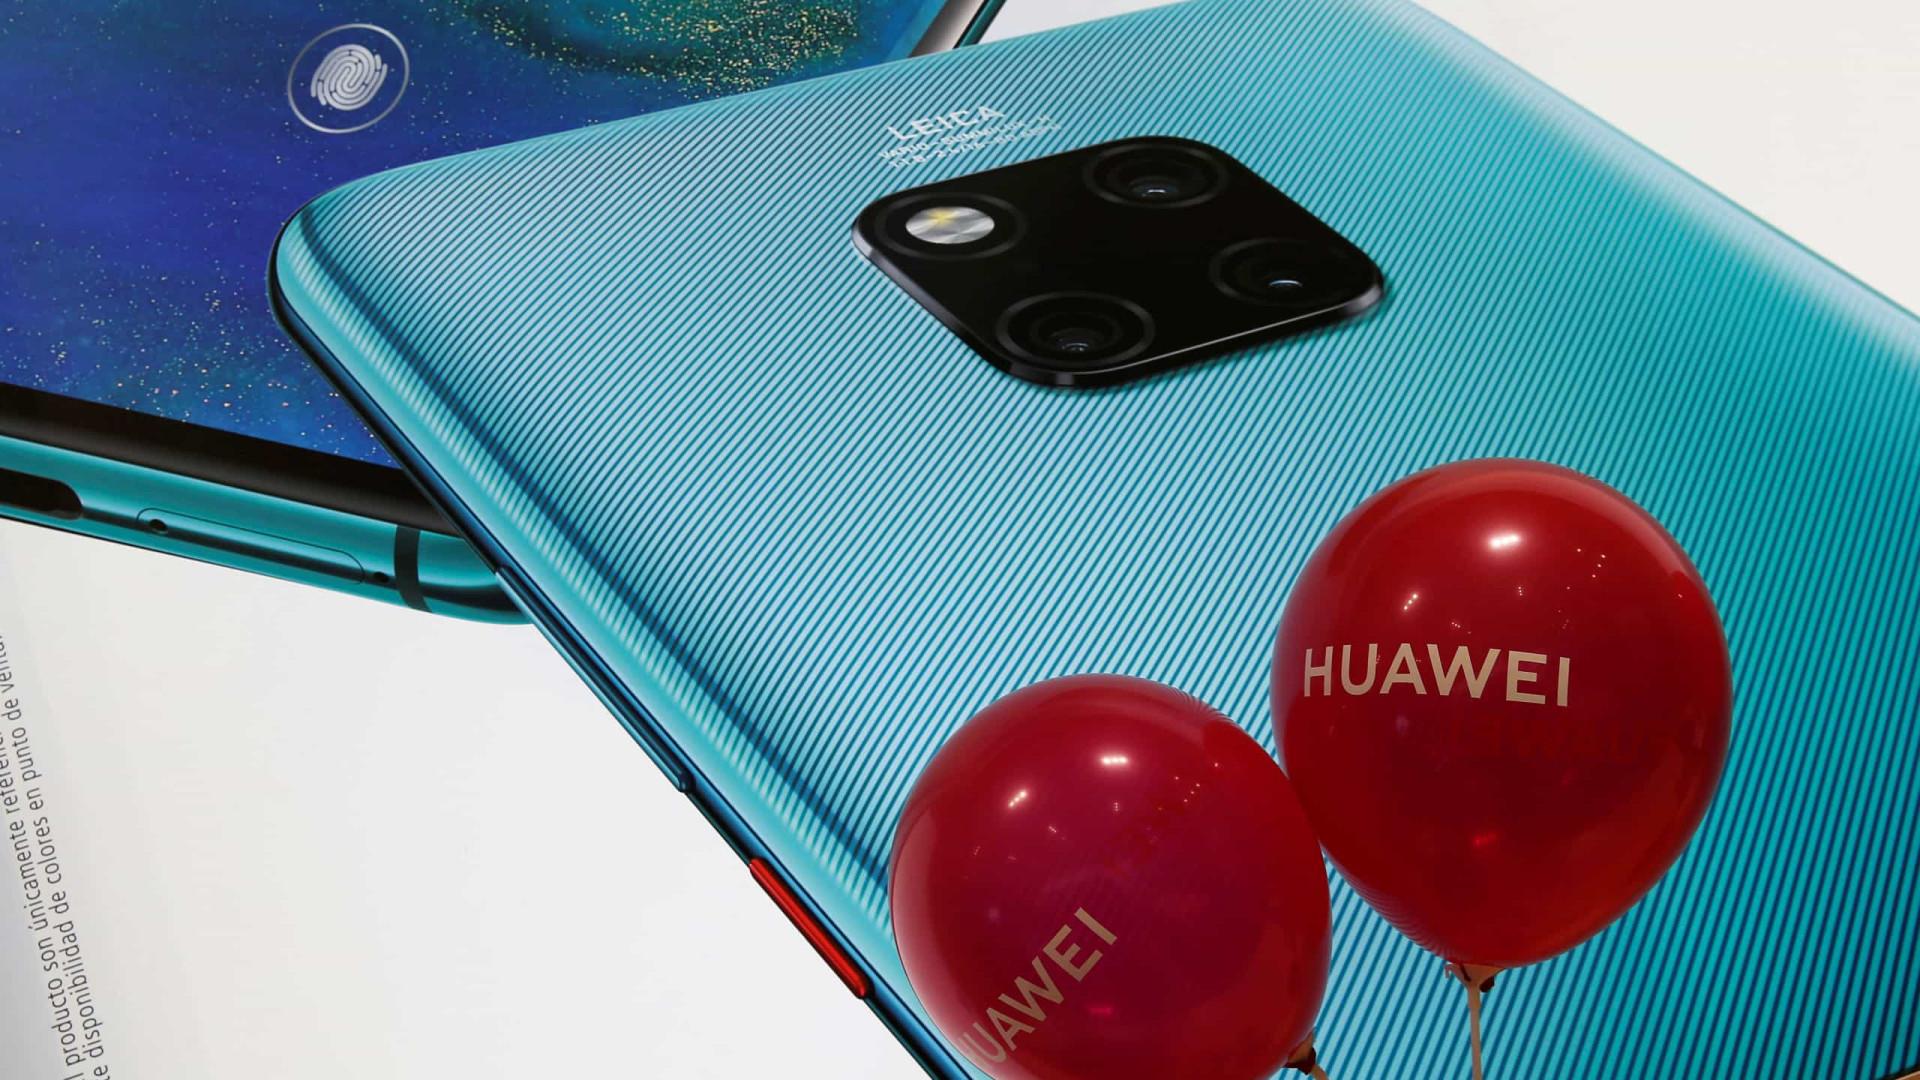 Taiwan suspende vendas de smartphones da Huawei